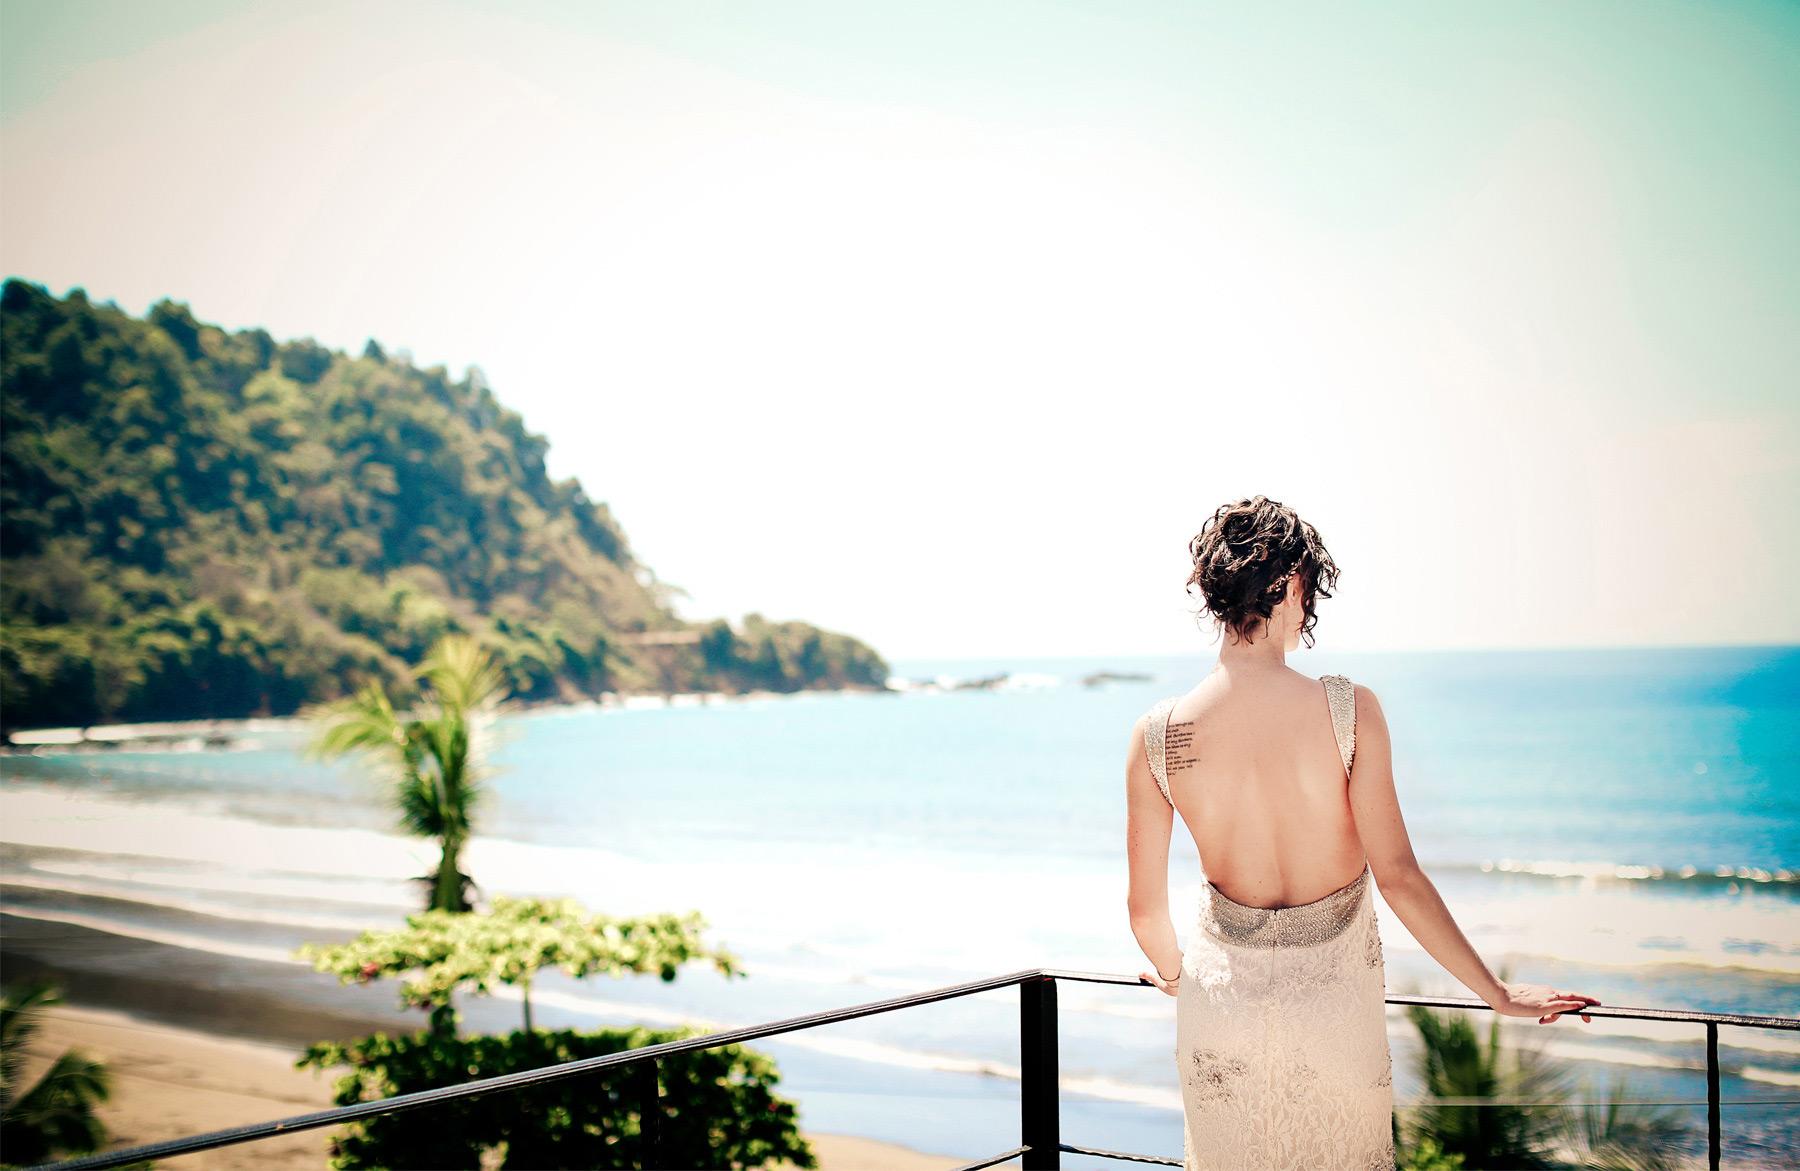 02-Costa-Rica-Wedding-Photography-by-Vick-Photography-Jaco-Tropical-Beach-Villa-Caletas-Resort-Alli-and-Duncan.jpg